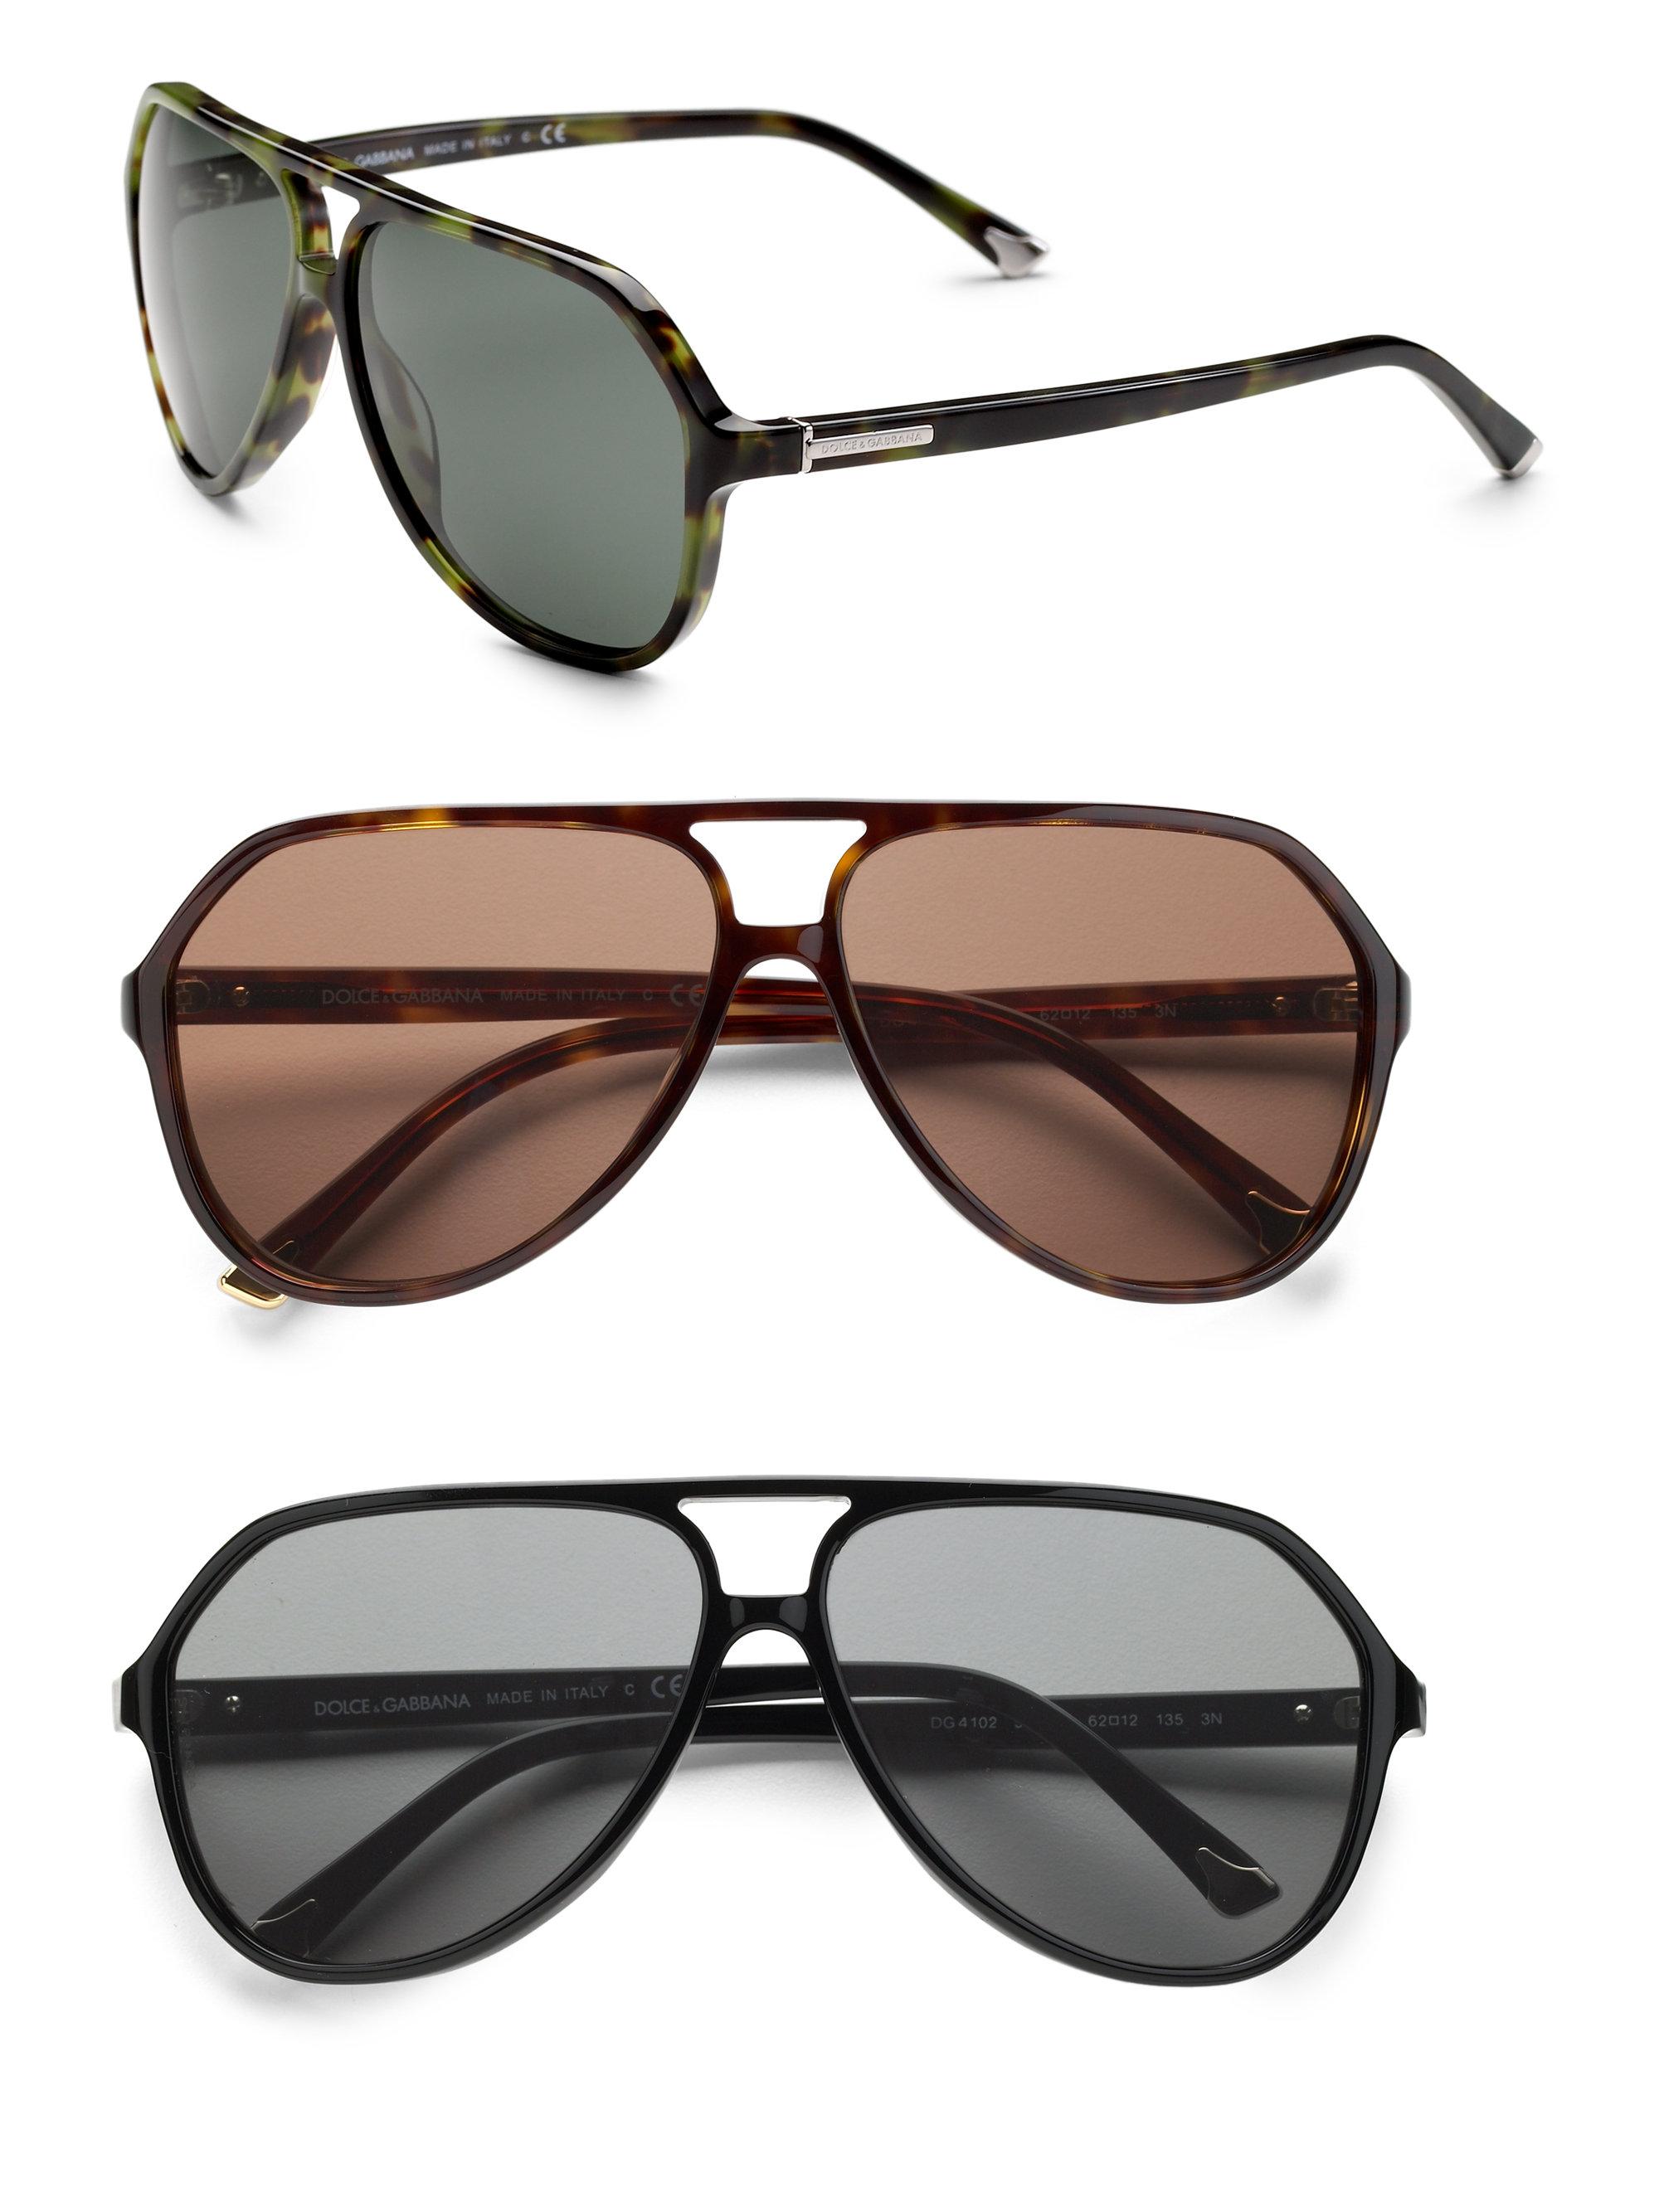 f7960949038 Lyst - Dolce   Gabbana Acetate Aviator Sunglasses in Black for Men